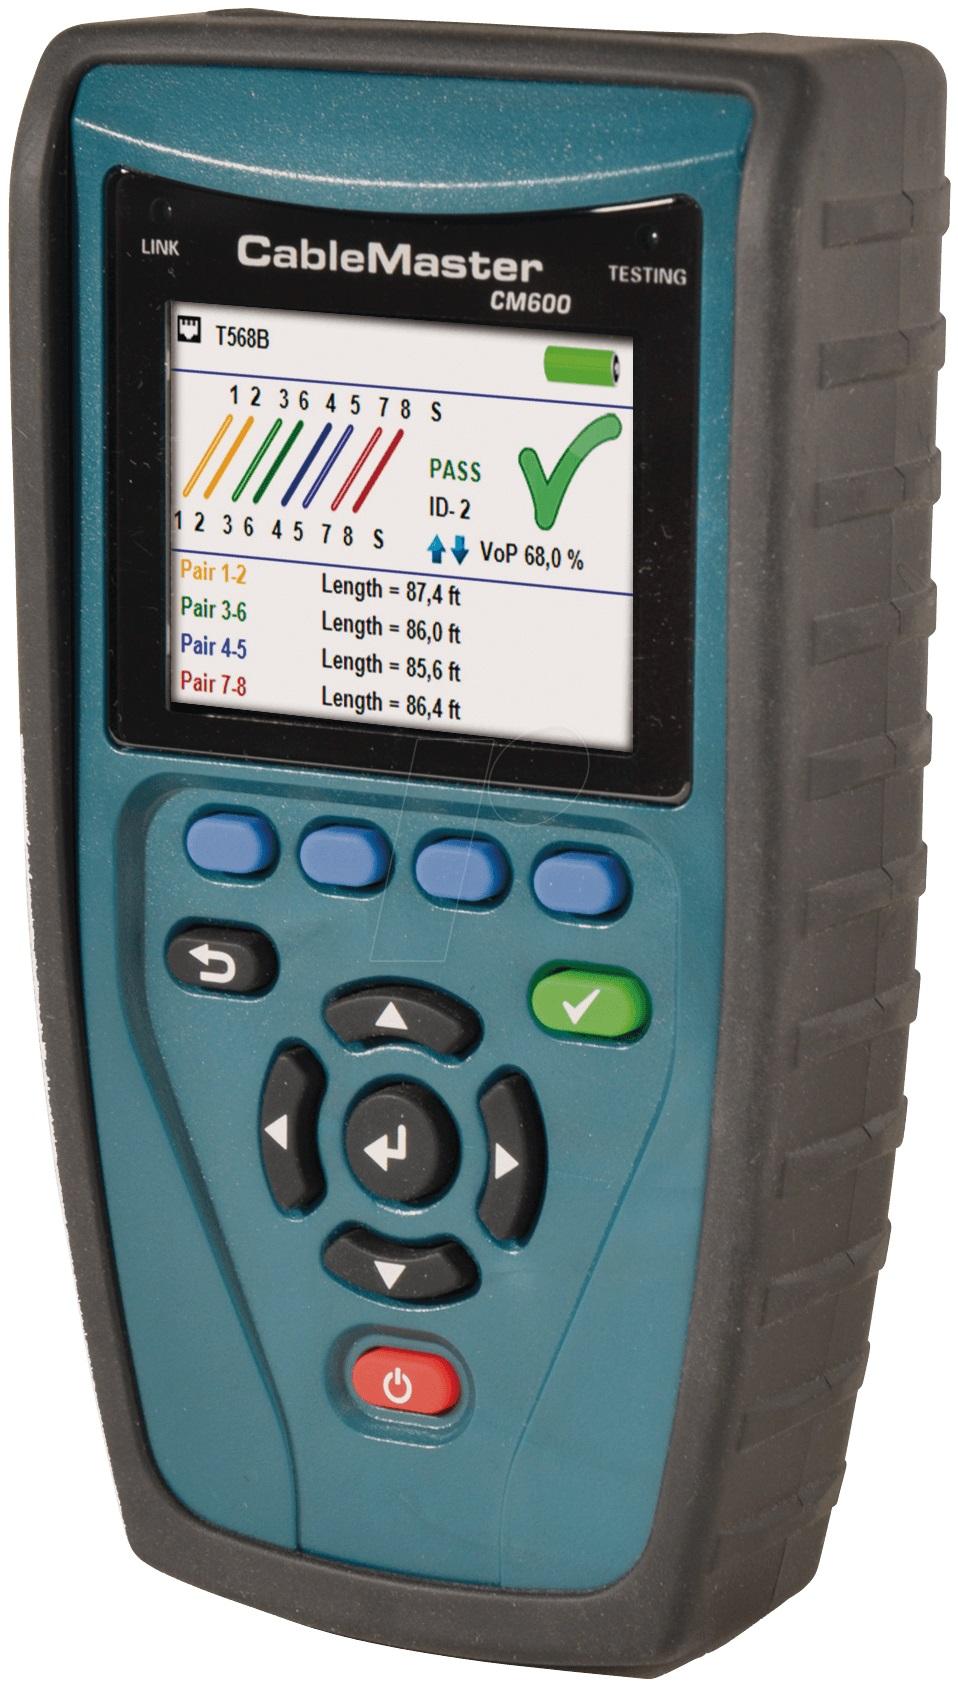 1 Stk CableMaster 600  Verdrahtungstester, Längenmessung, PoE HMSCM600--